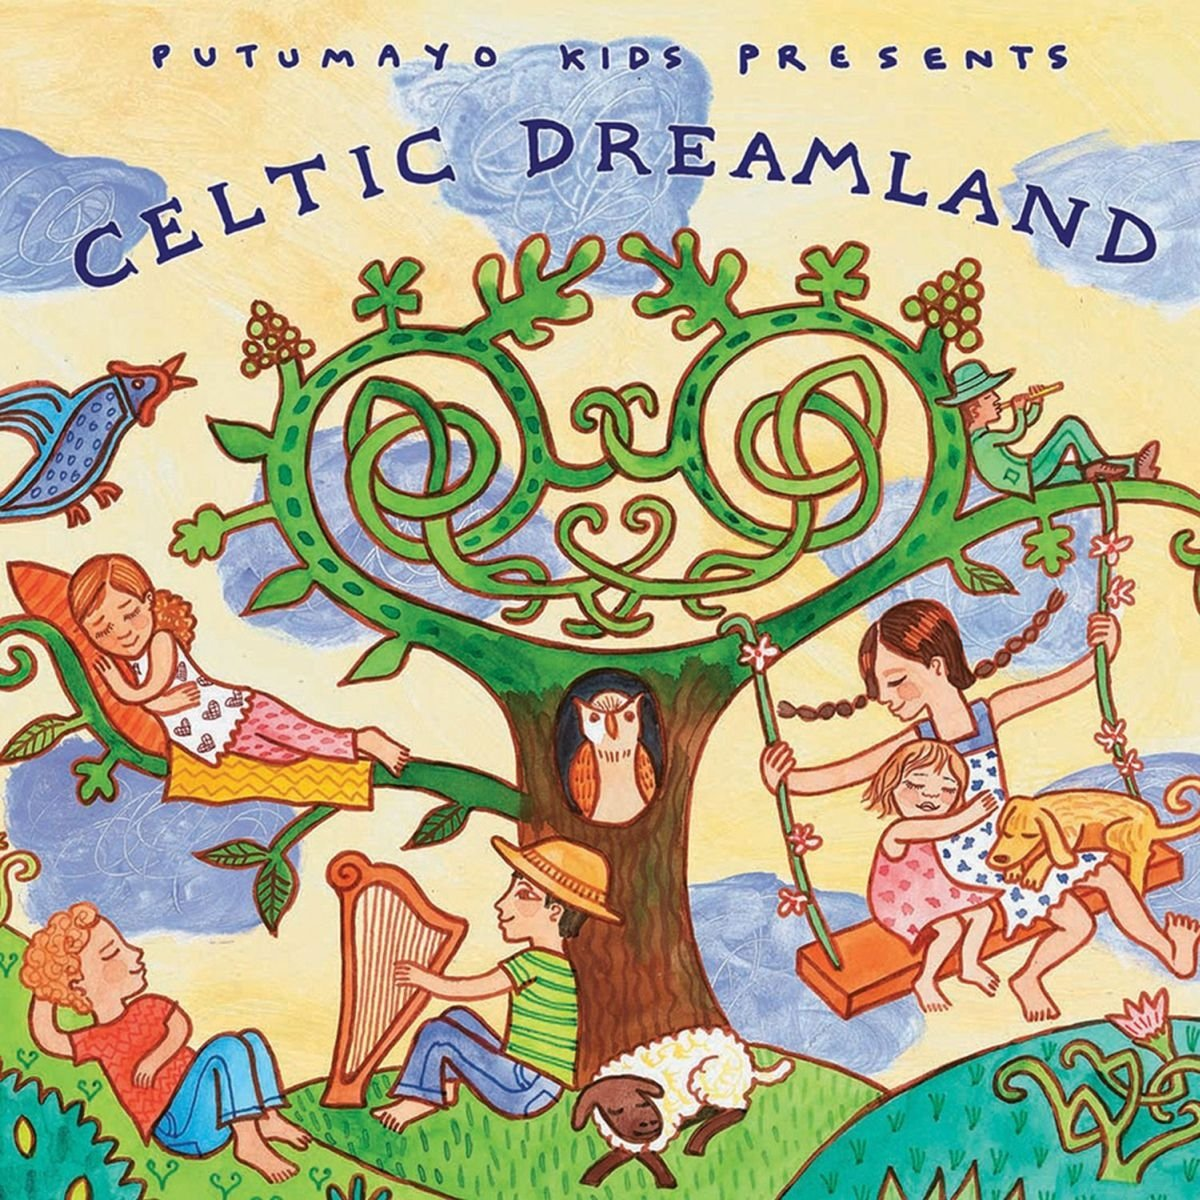 Putumayo Kids Celtic Dreamland CD